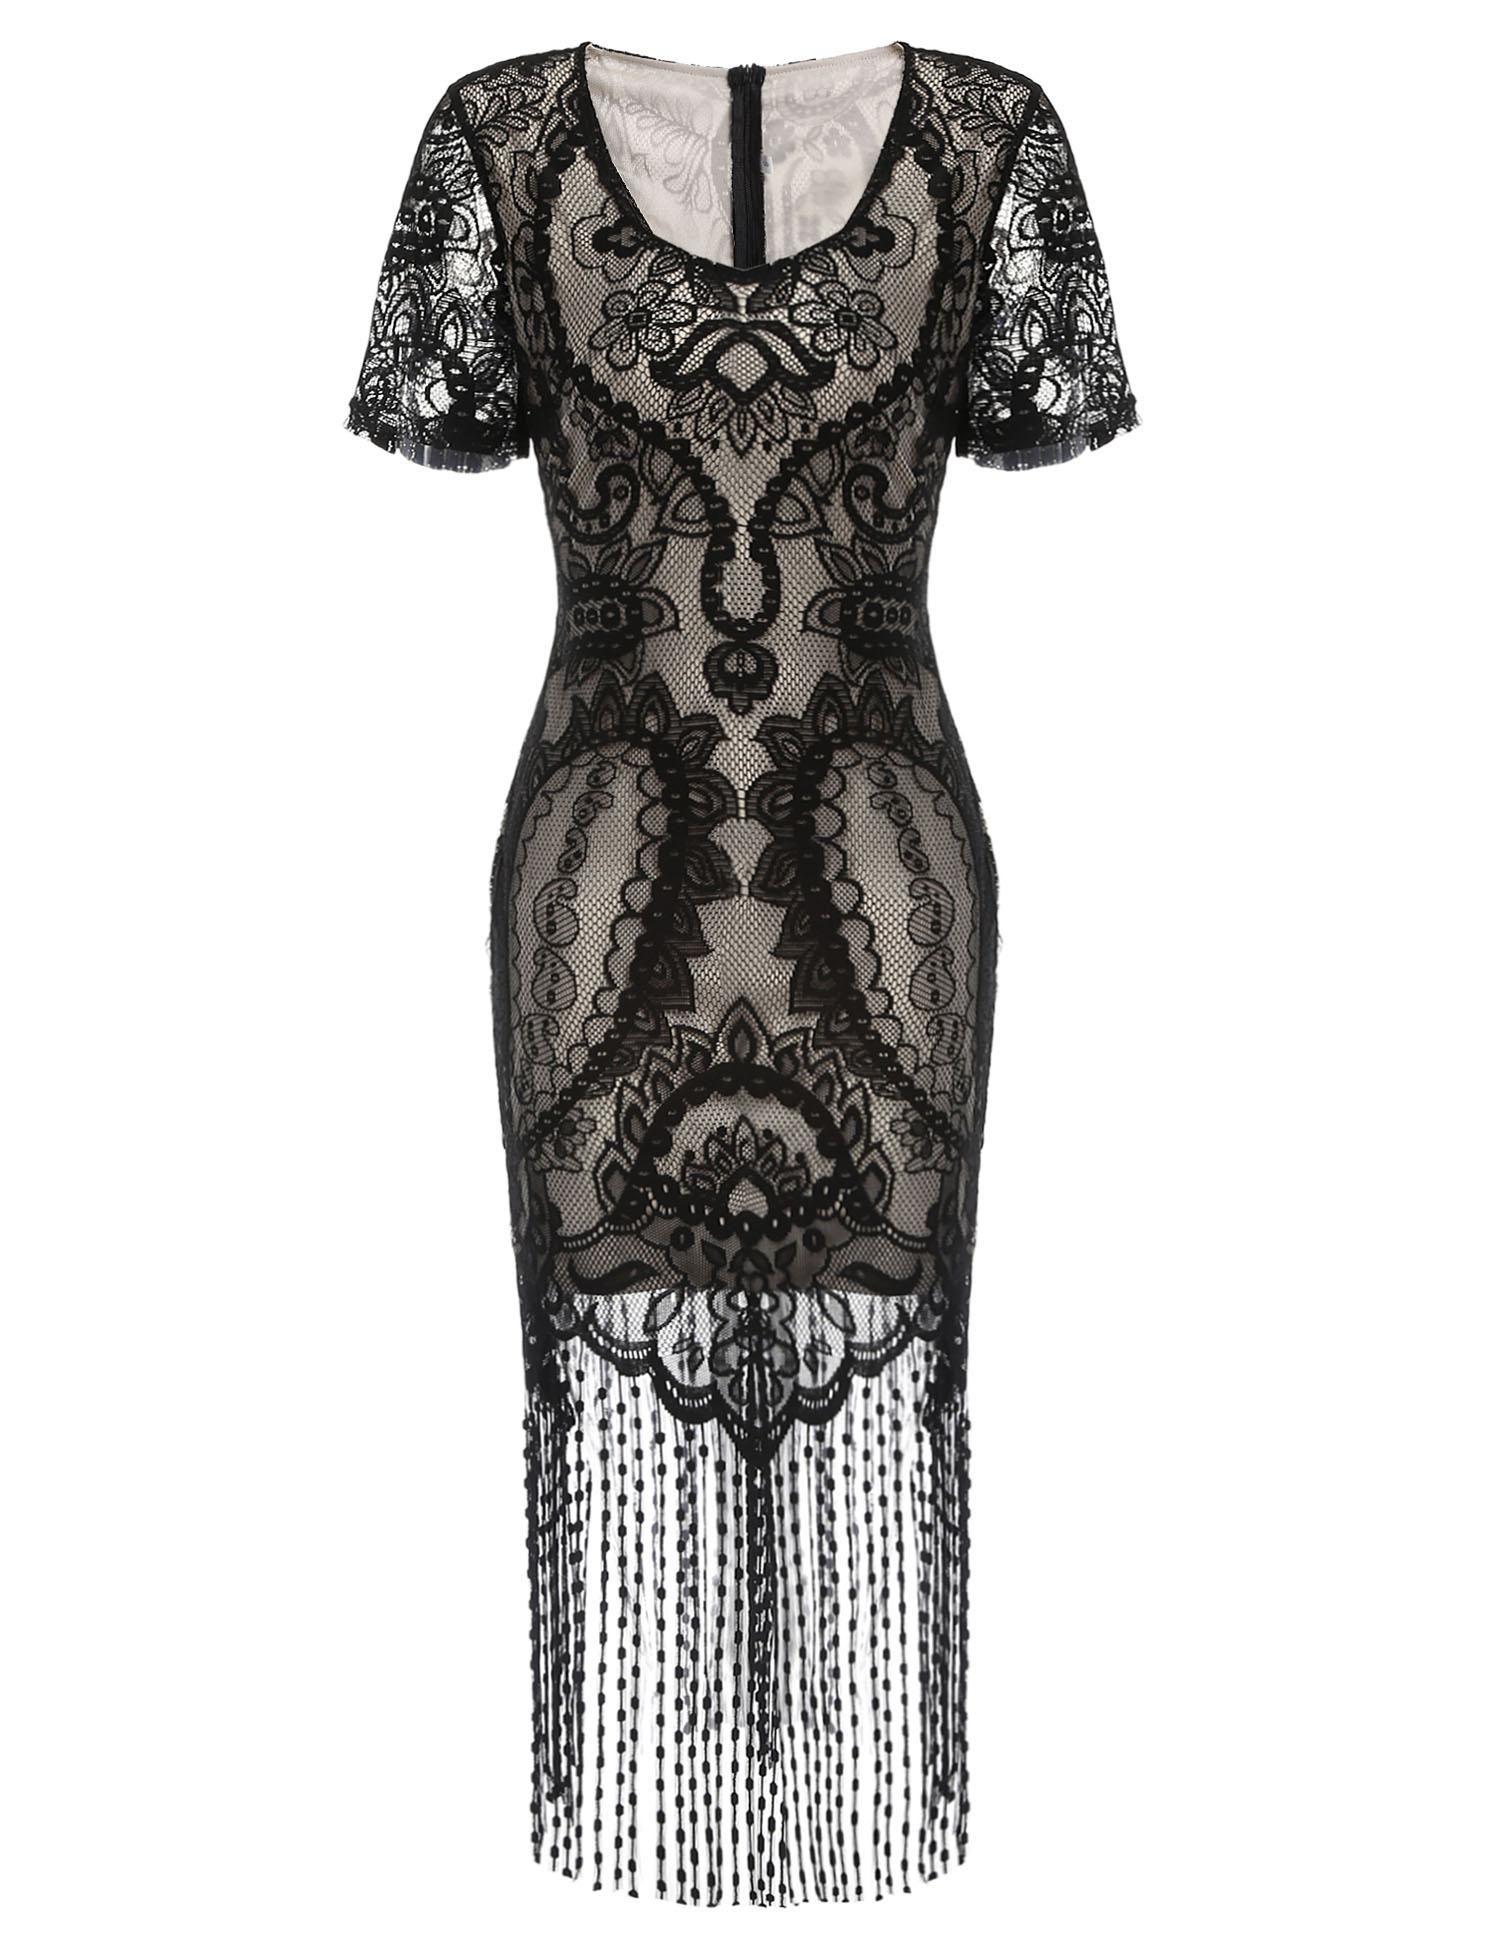 Black short sleeve s v neck vintage styles lace patchwork